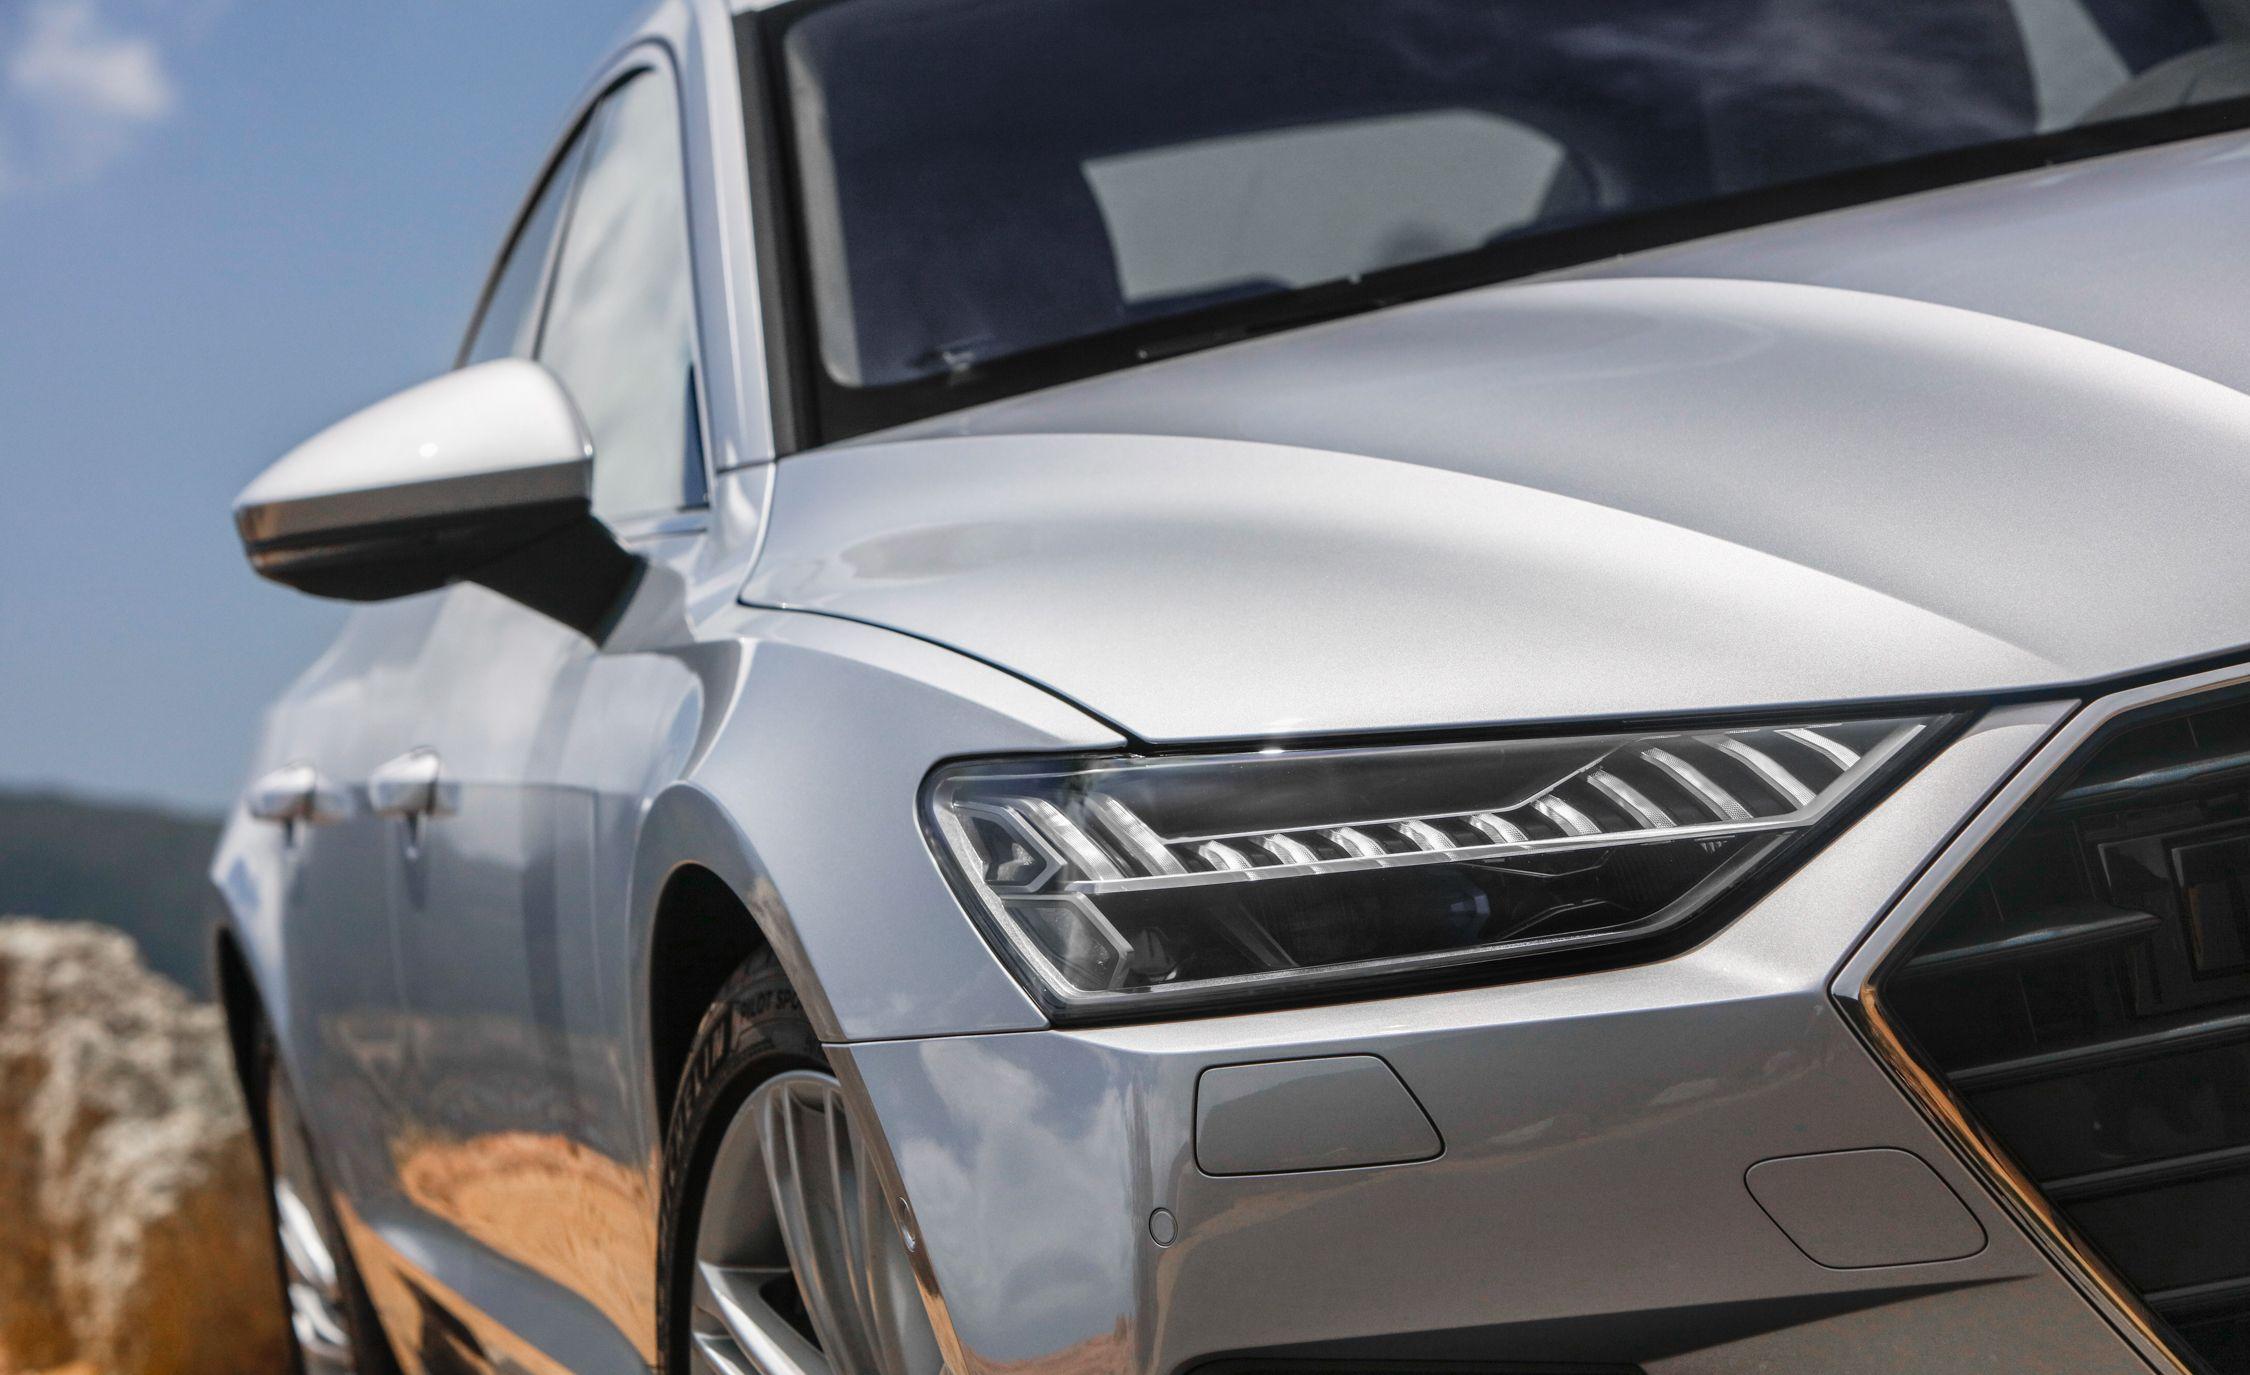 2019-Audi-A7-Sportback-154-1.jpg